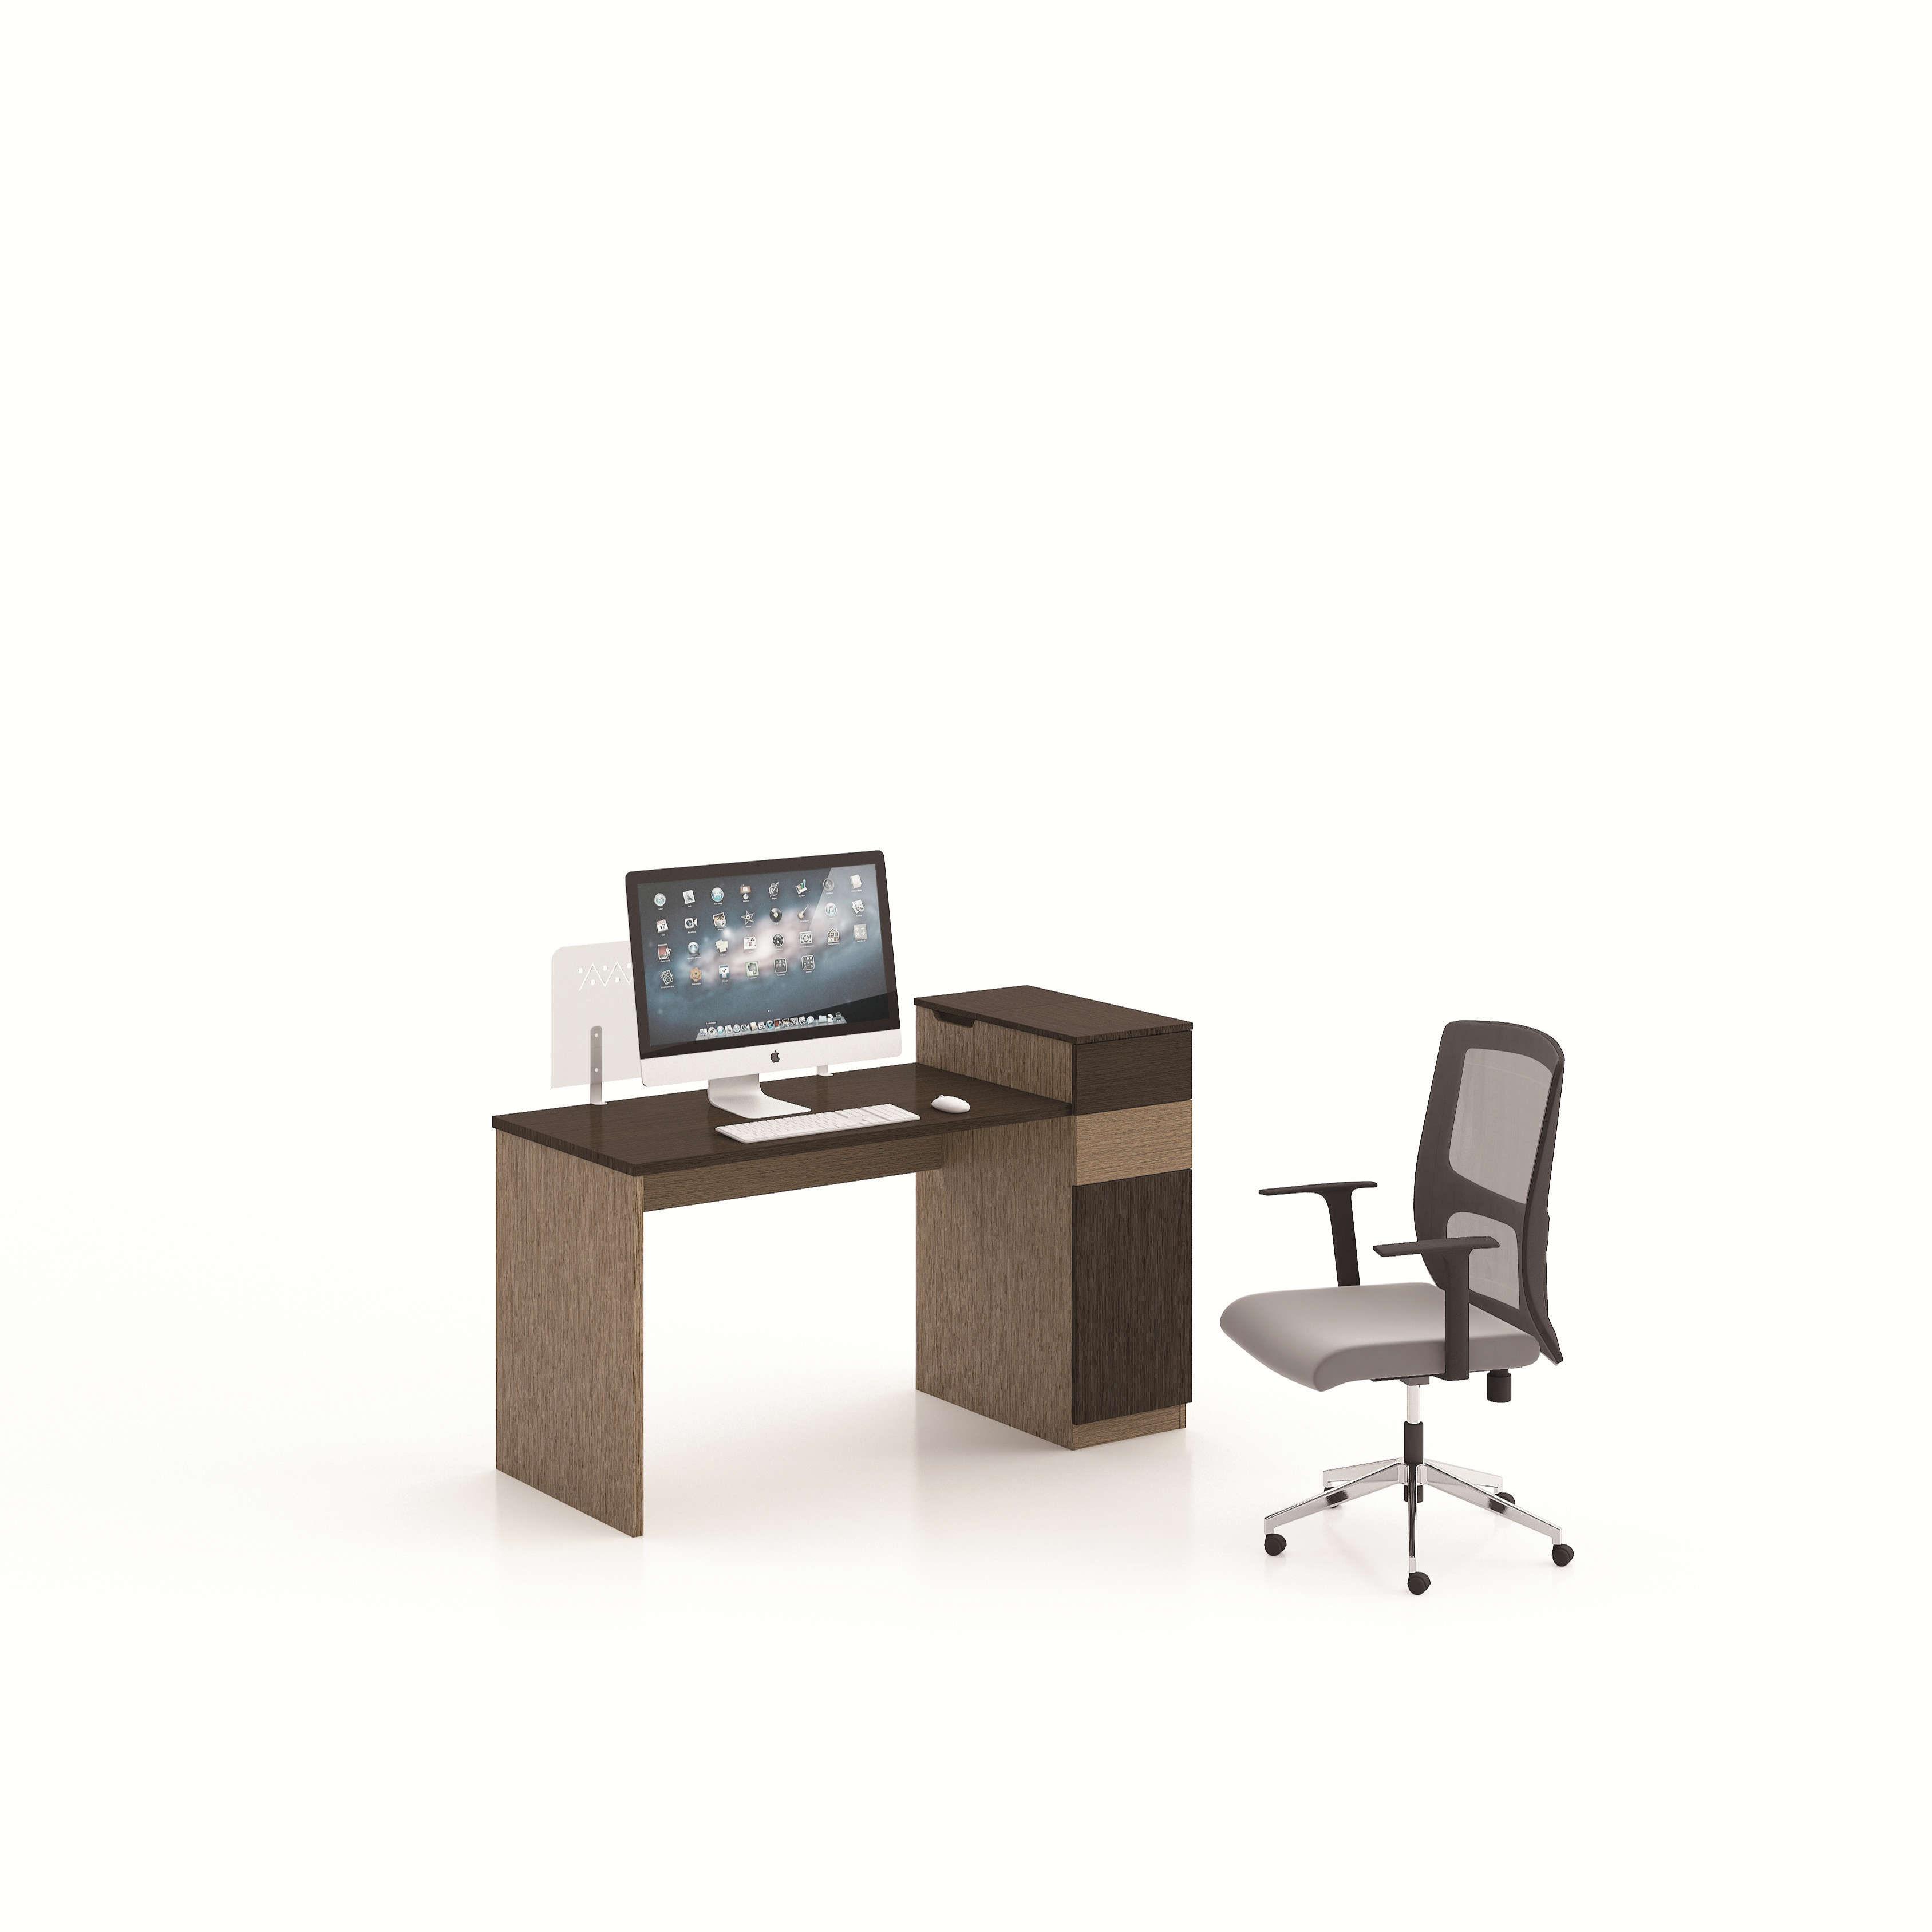 Wholesale Workstation Office Modern Multimedia Workstation Desk In House Or Company